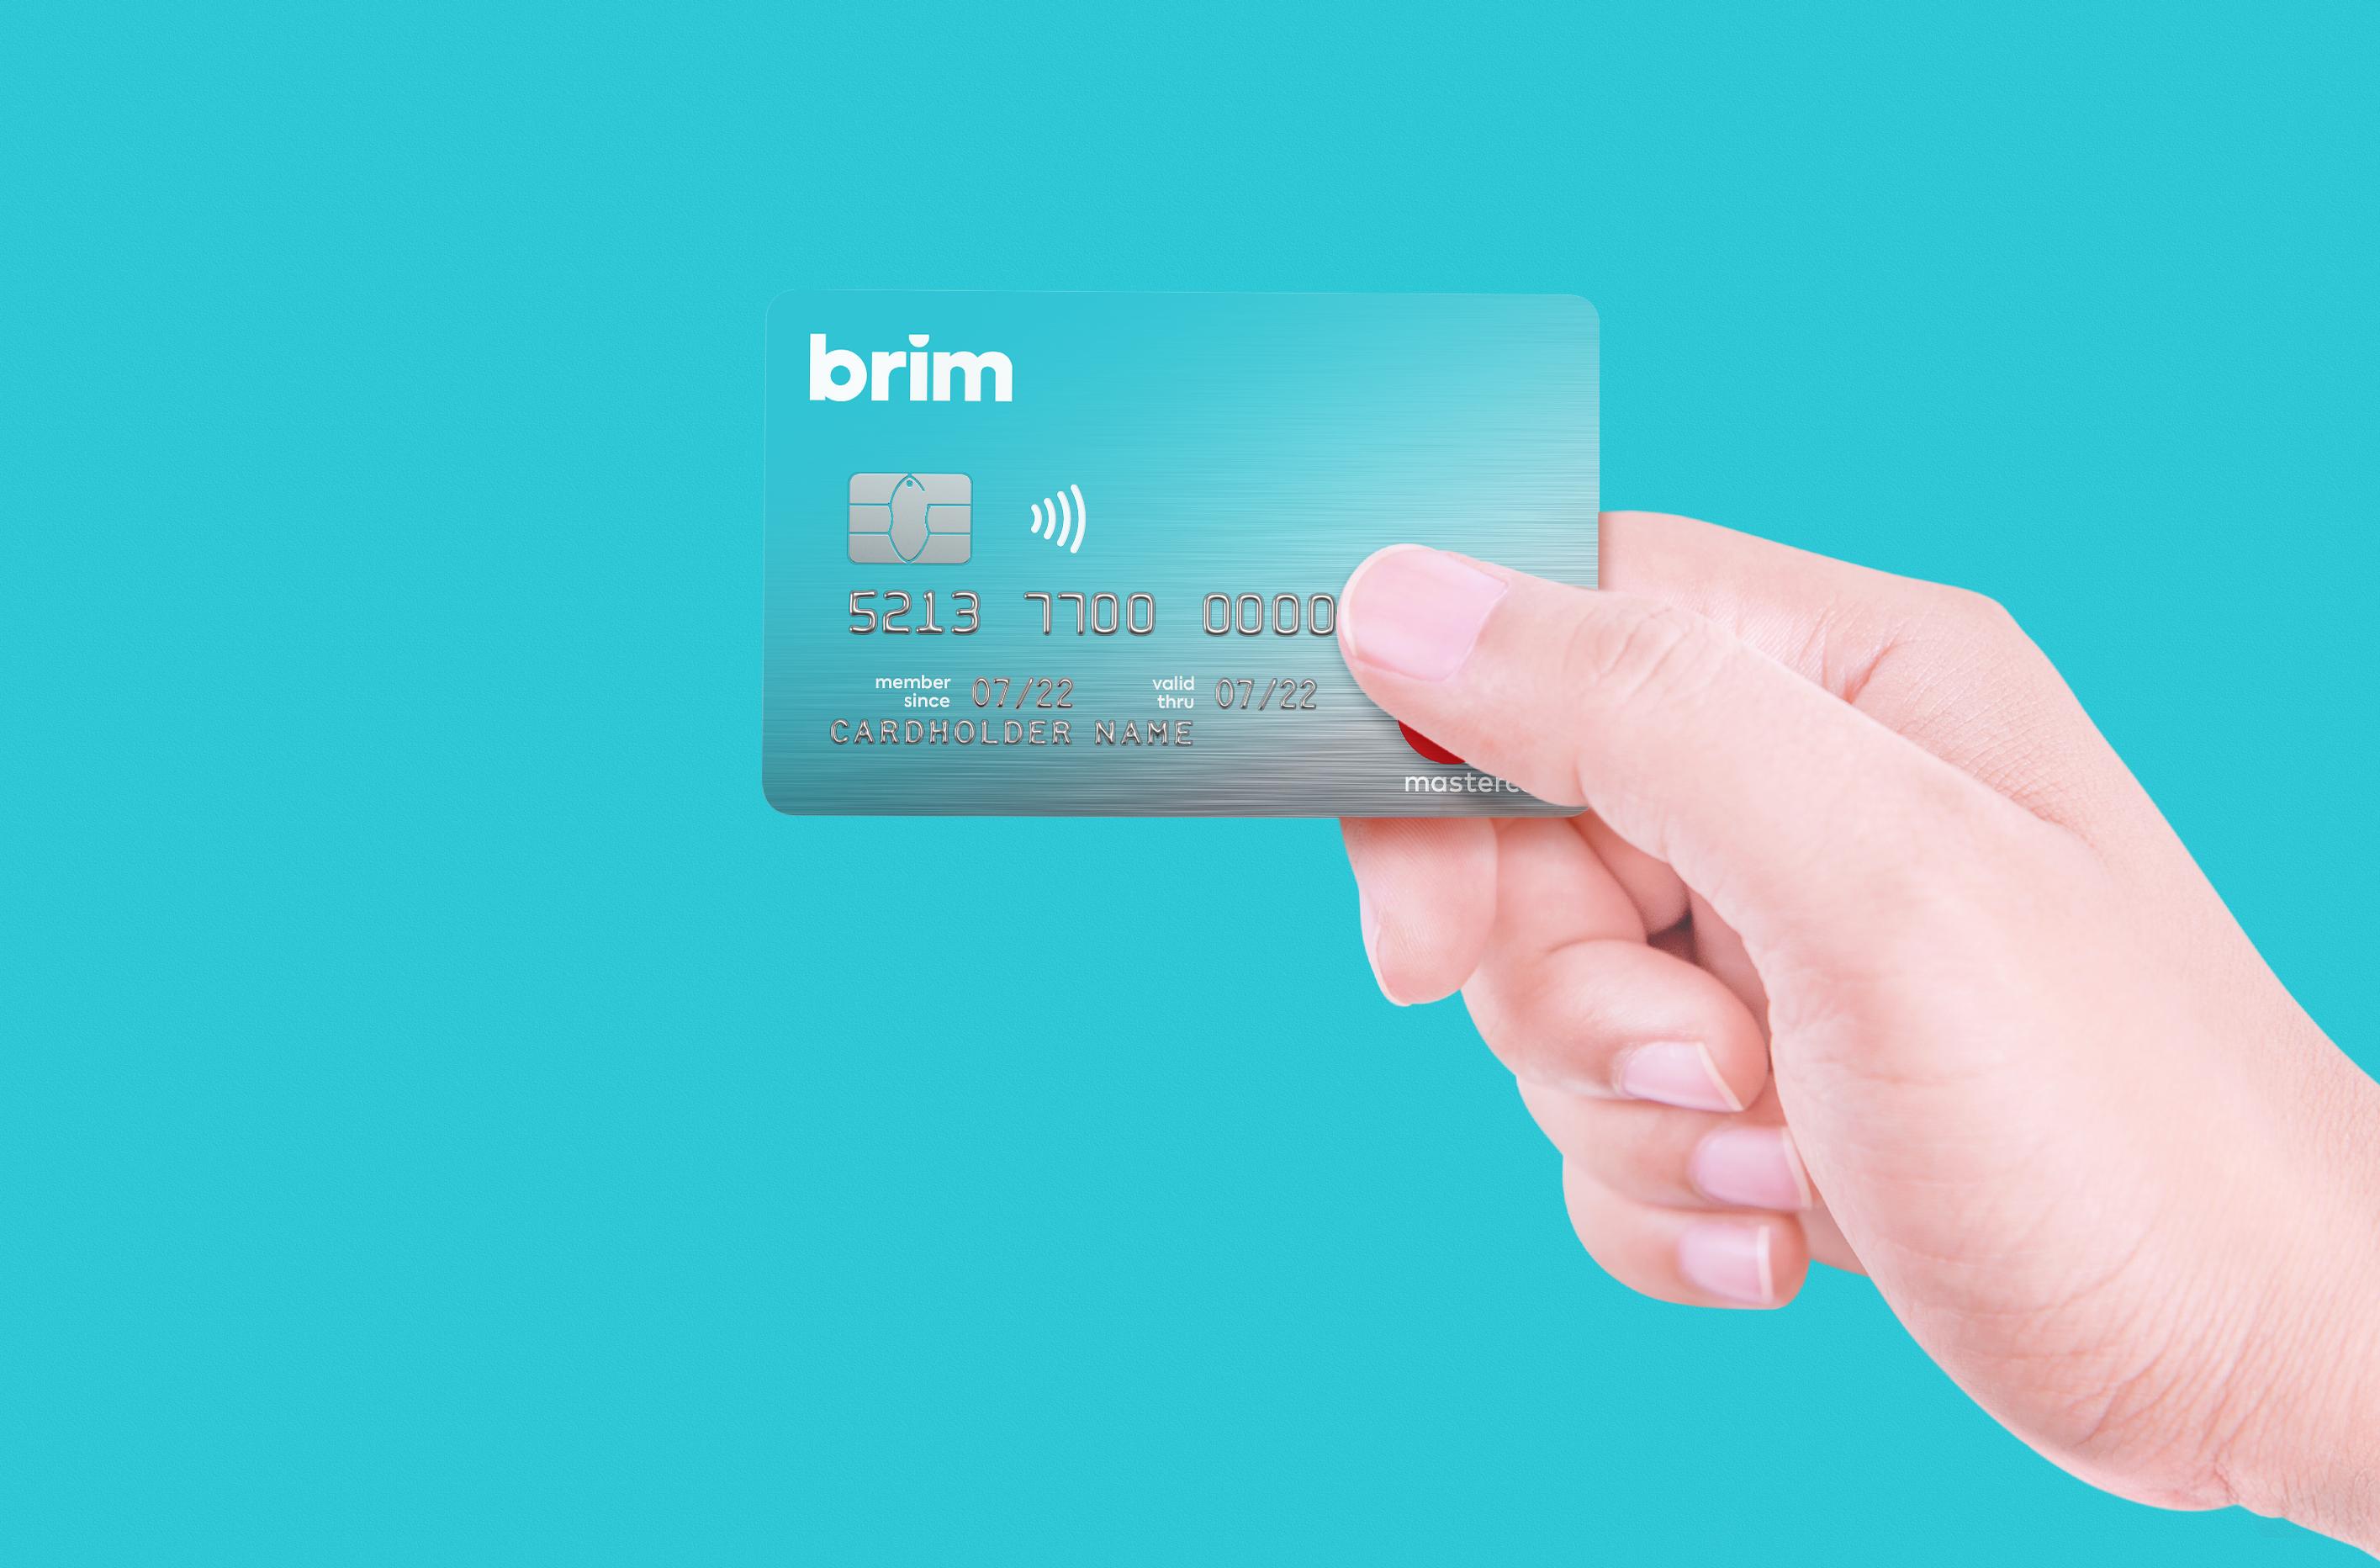 Brim Card Hand